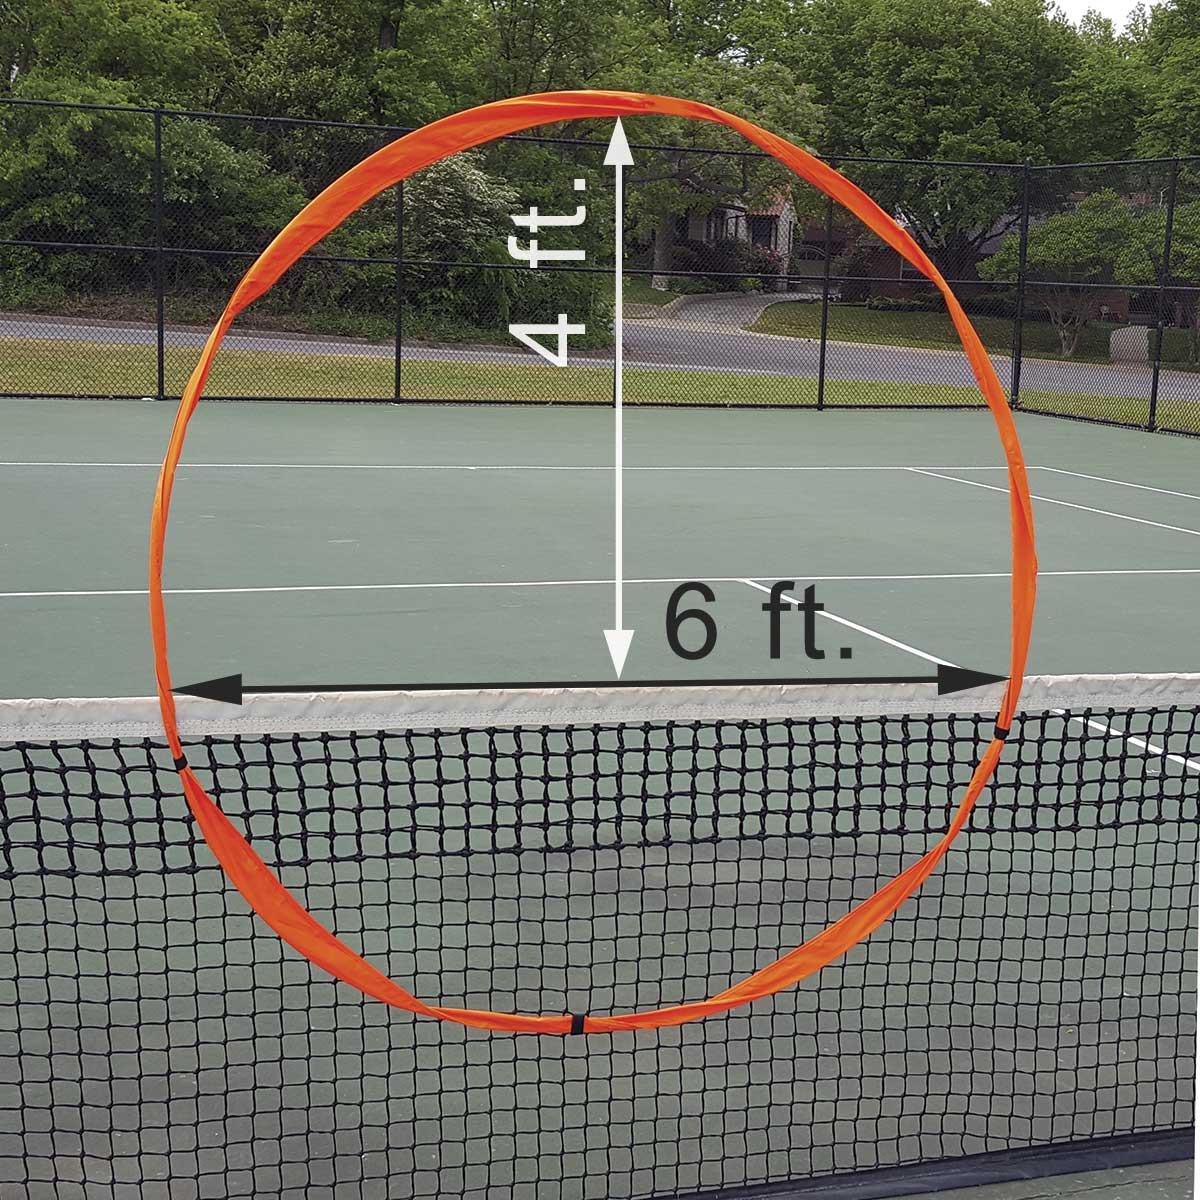 b6e3be3cff Tennis Practice Target Rings - Tennis Training Equipment